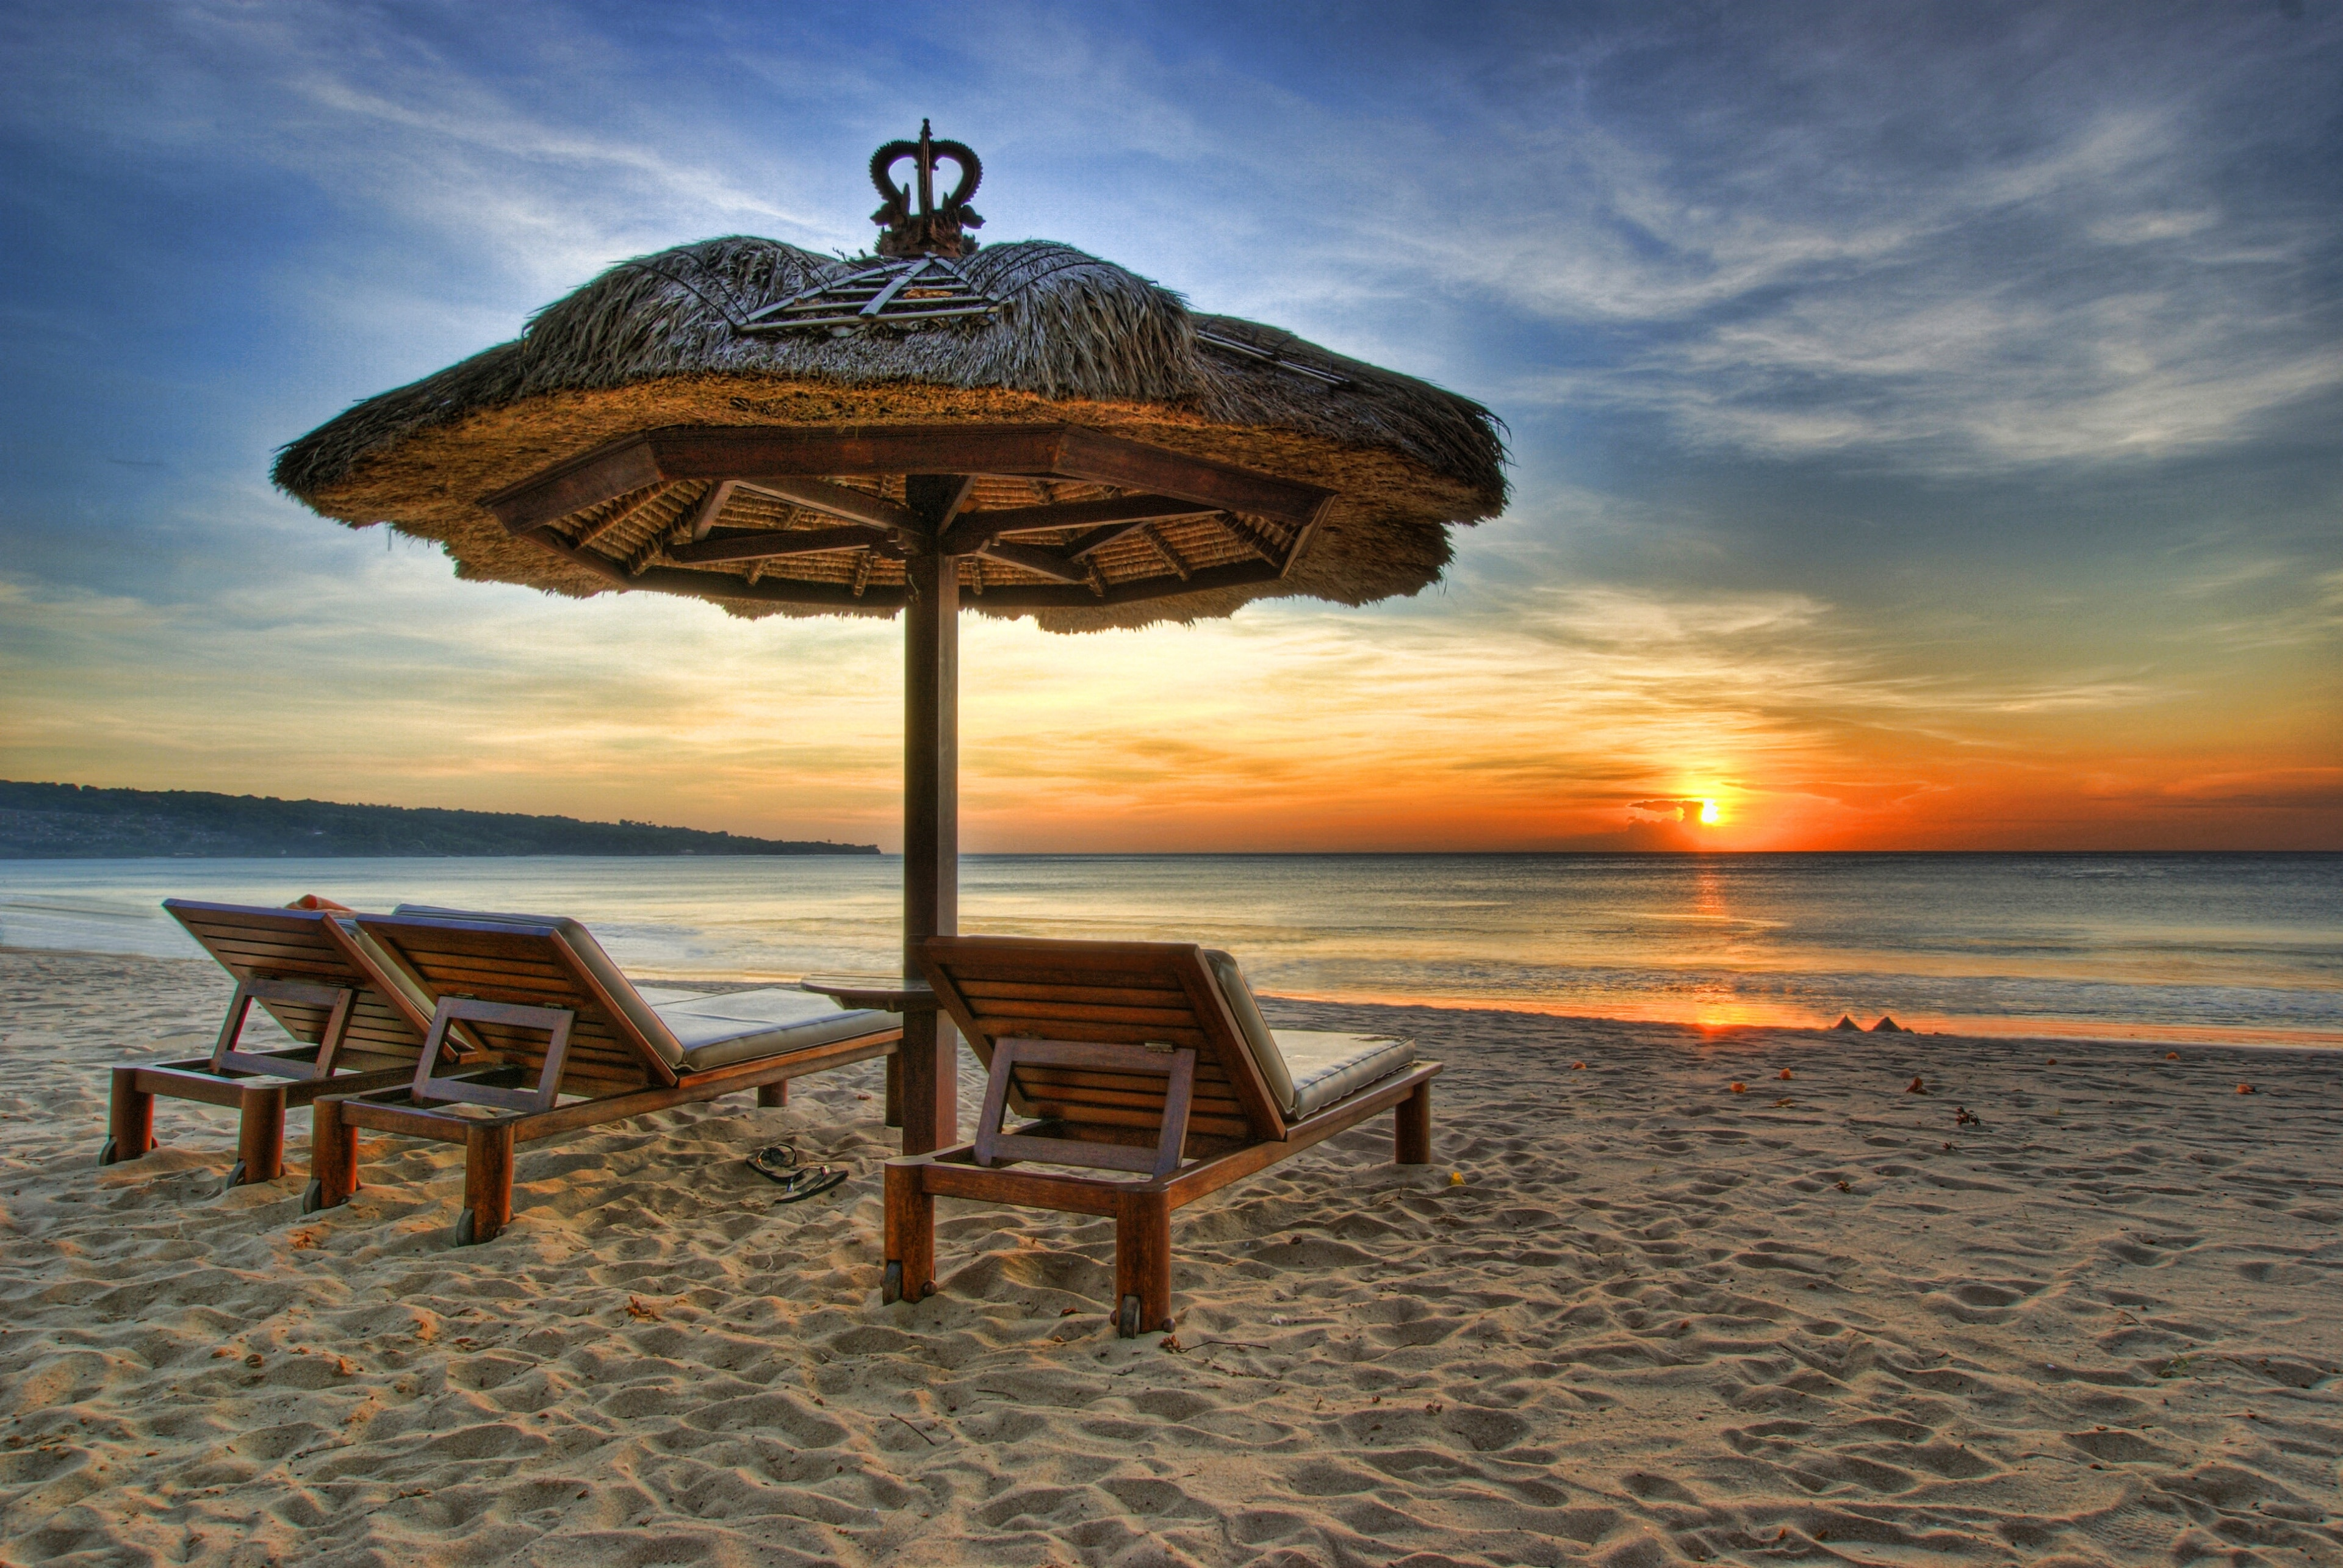 Mumbul, Nusa Dua, Bali, Indonesia